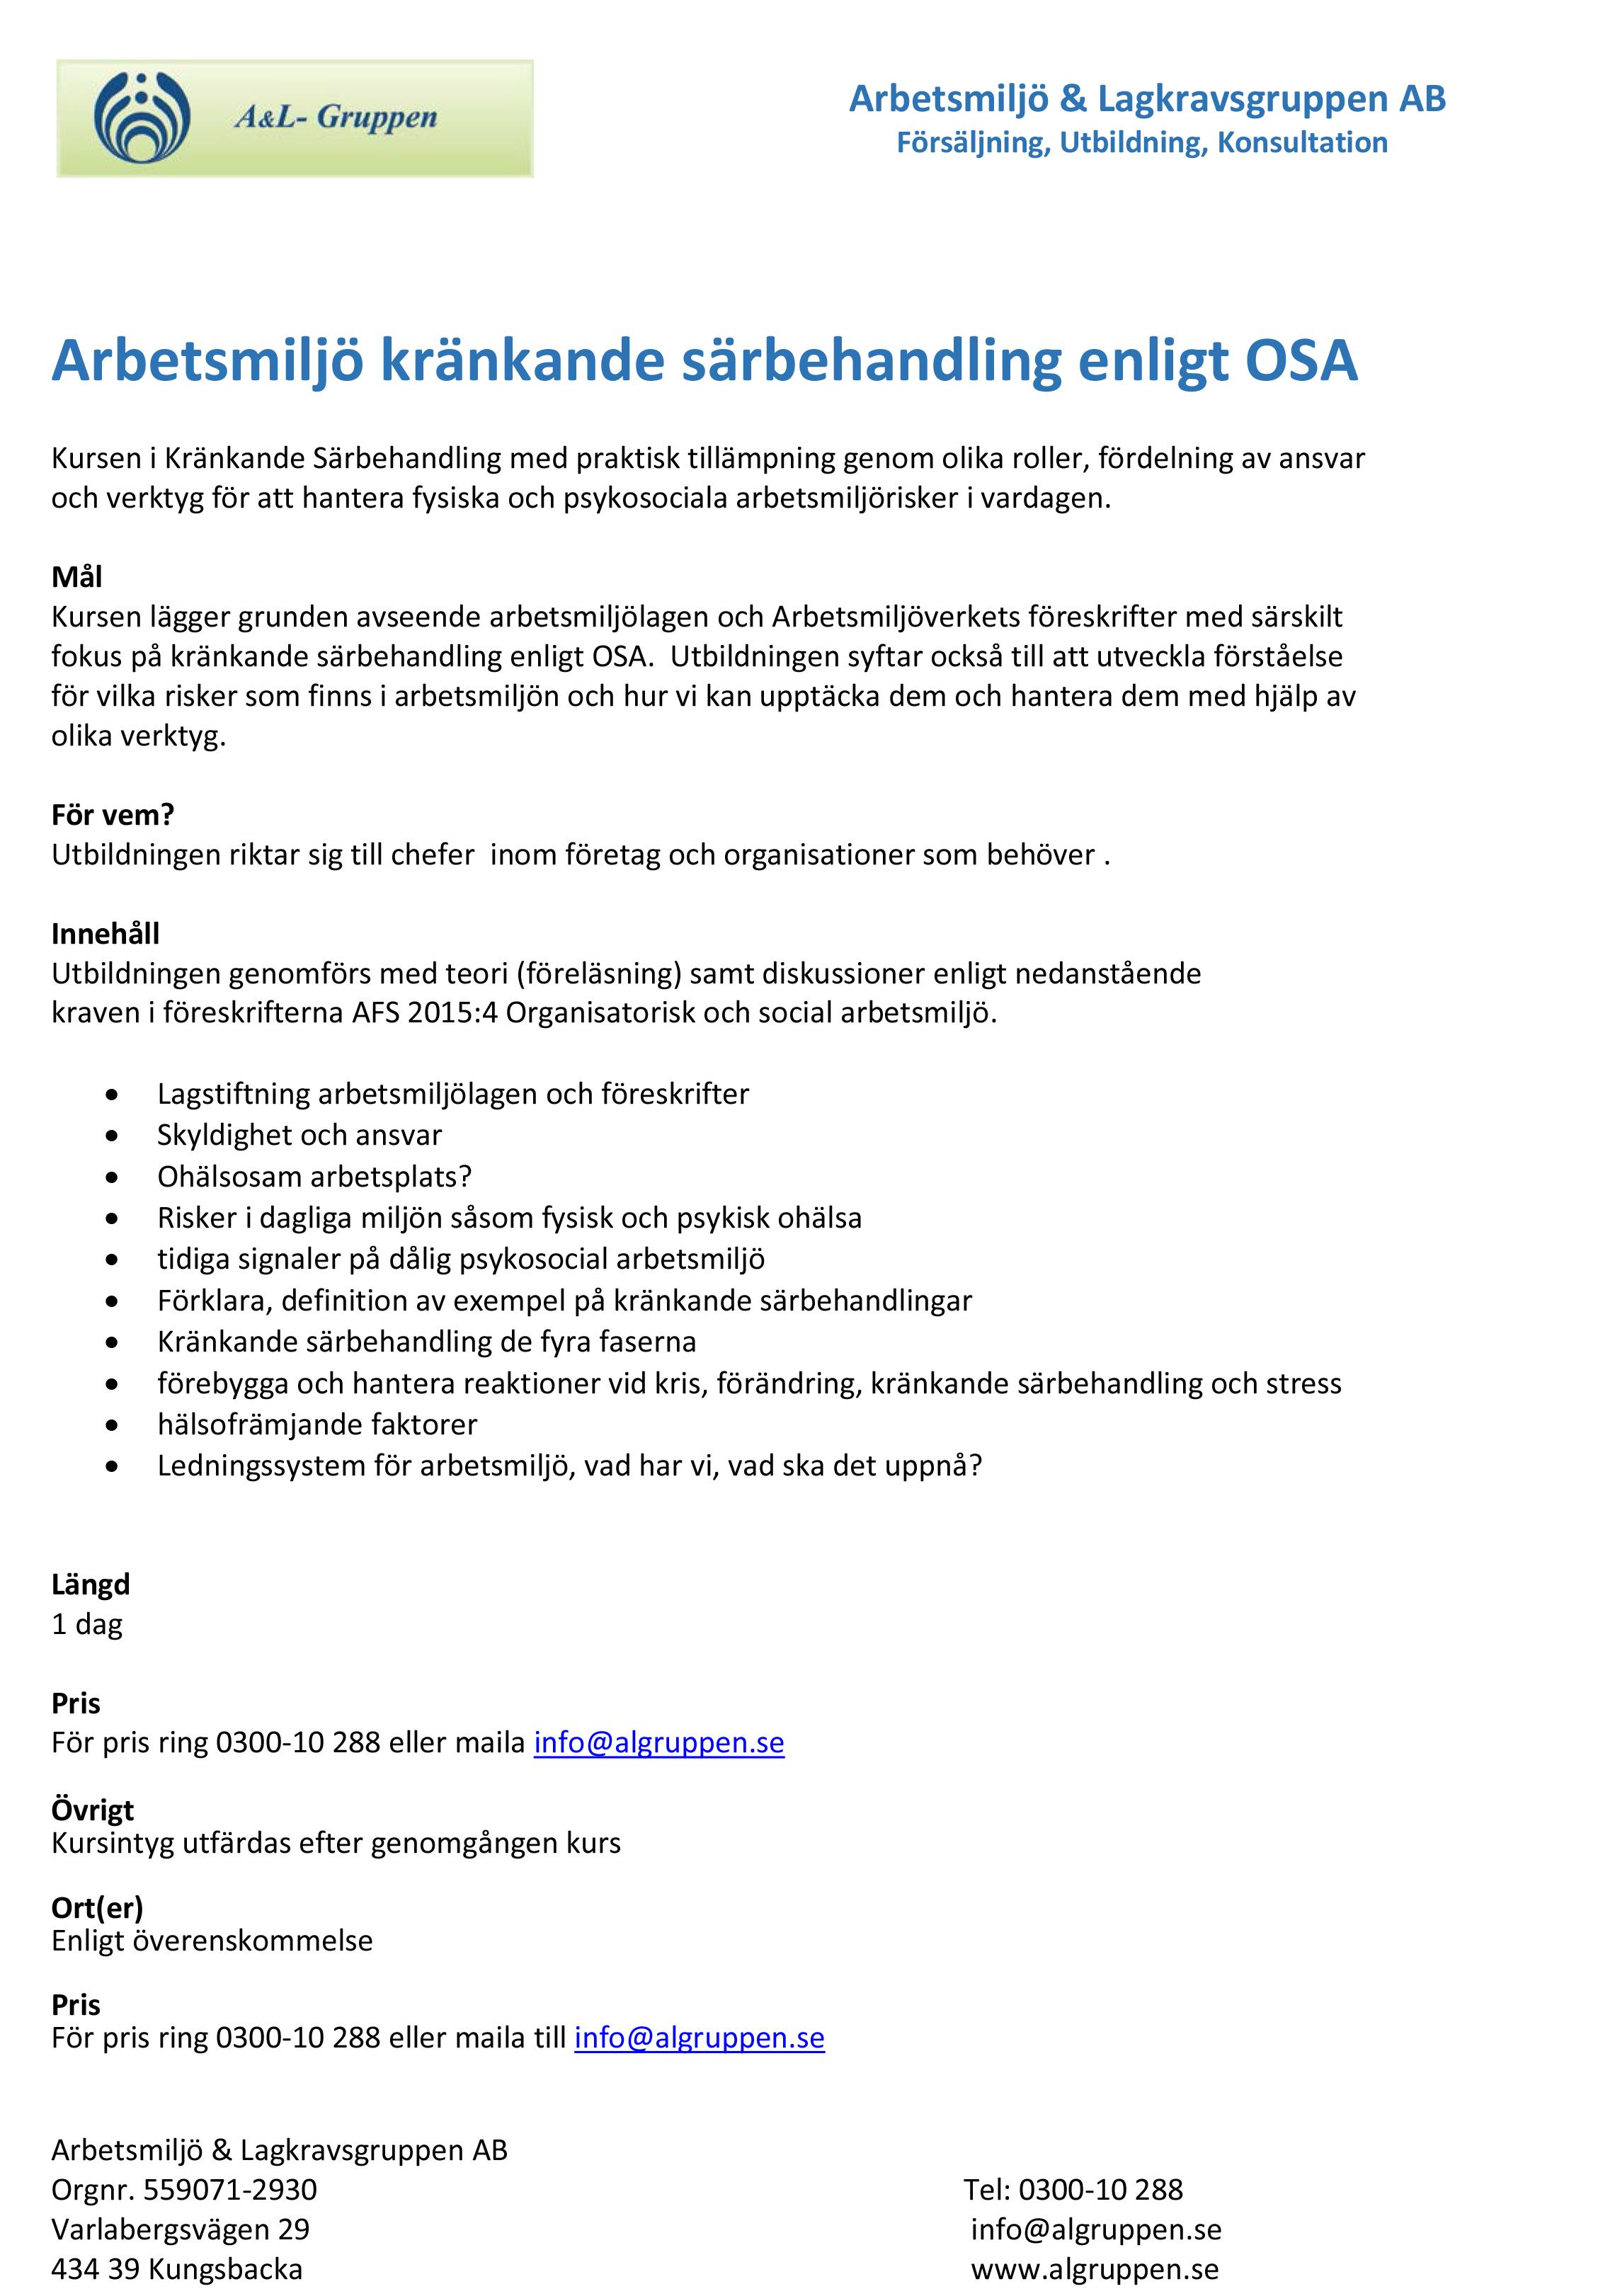 Arbetsmiljo-Krankande-sarbehandling-enligt-OSA1-dag